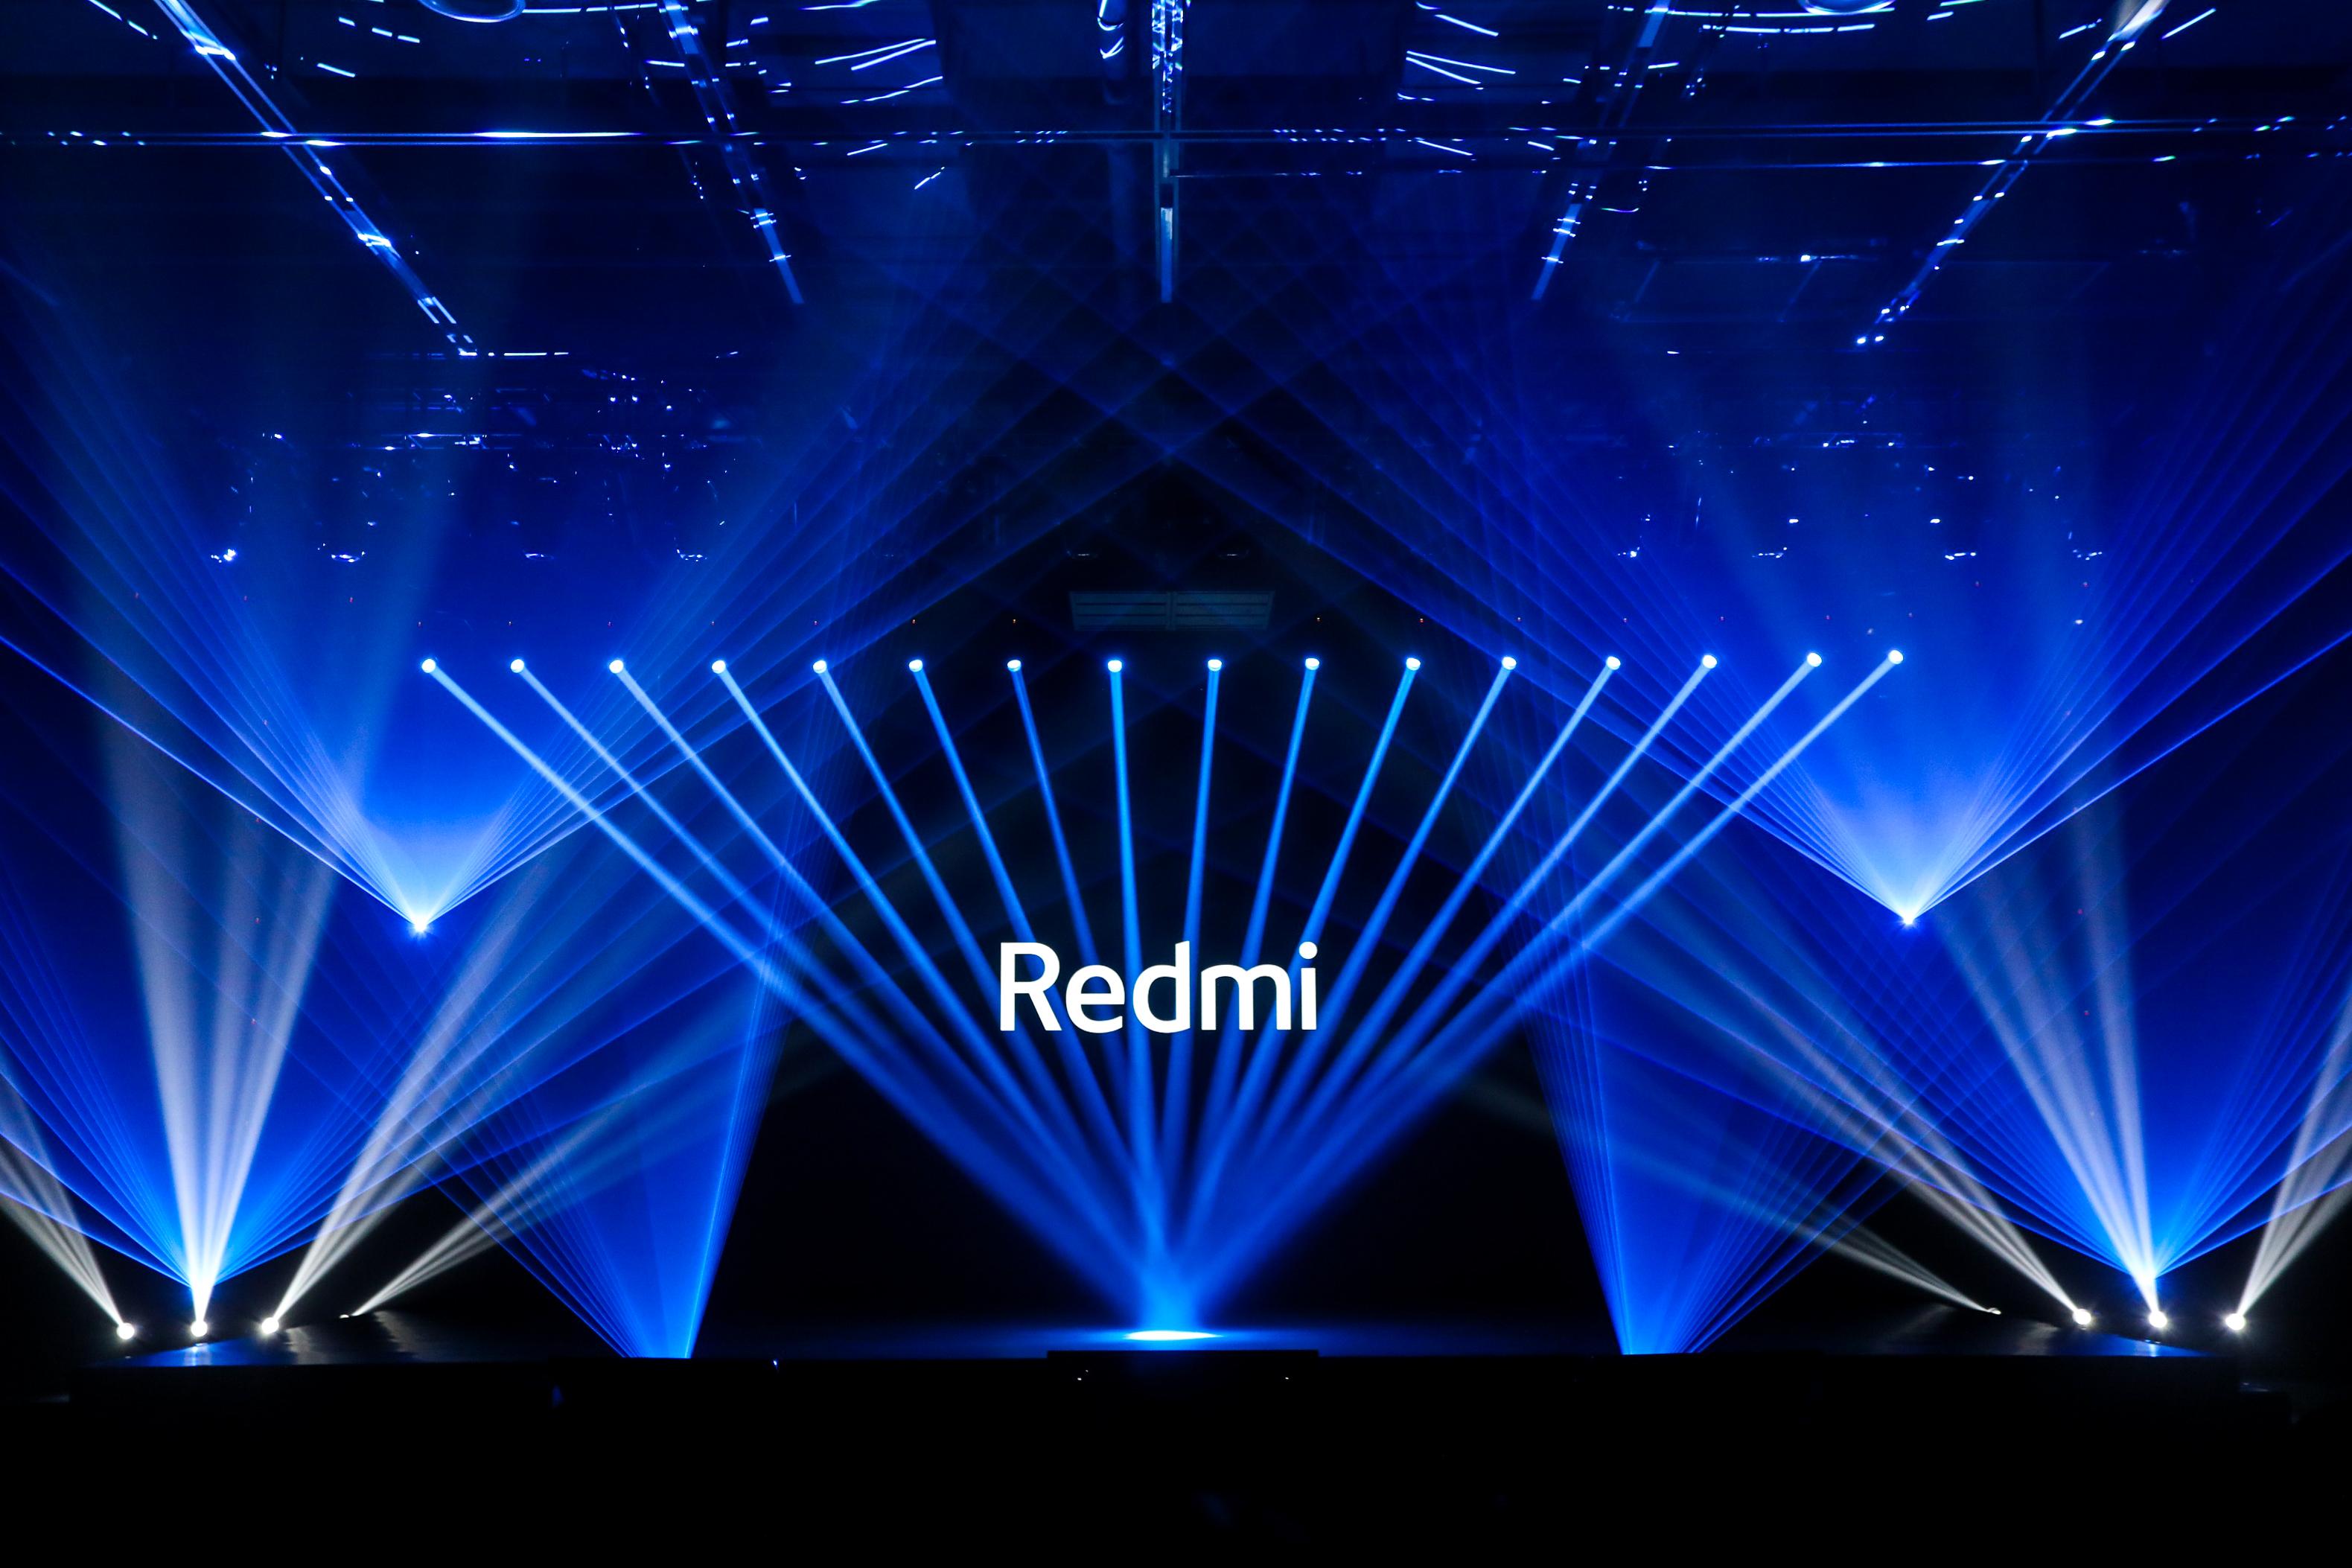 Redmi召开K40双旗舰发布会 全线高性价比新品劲爆开售